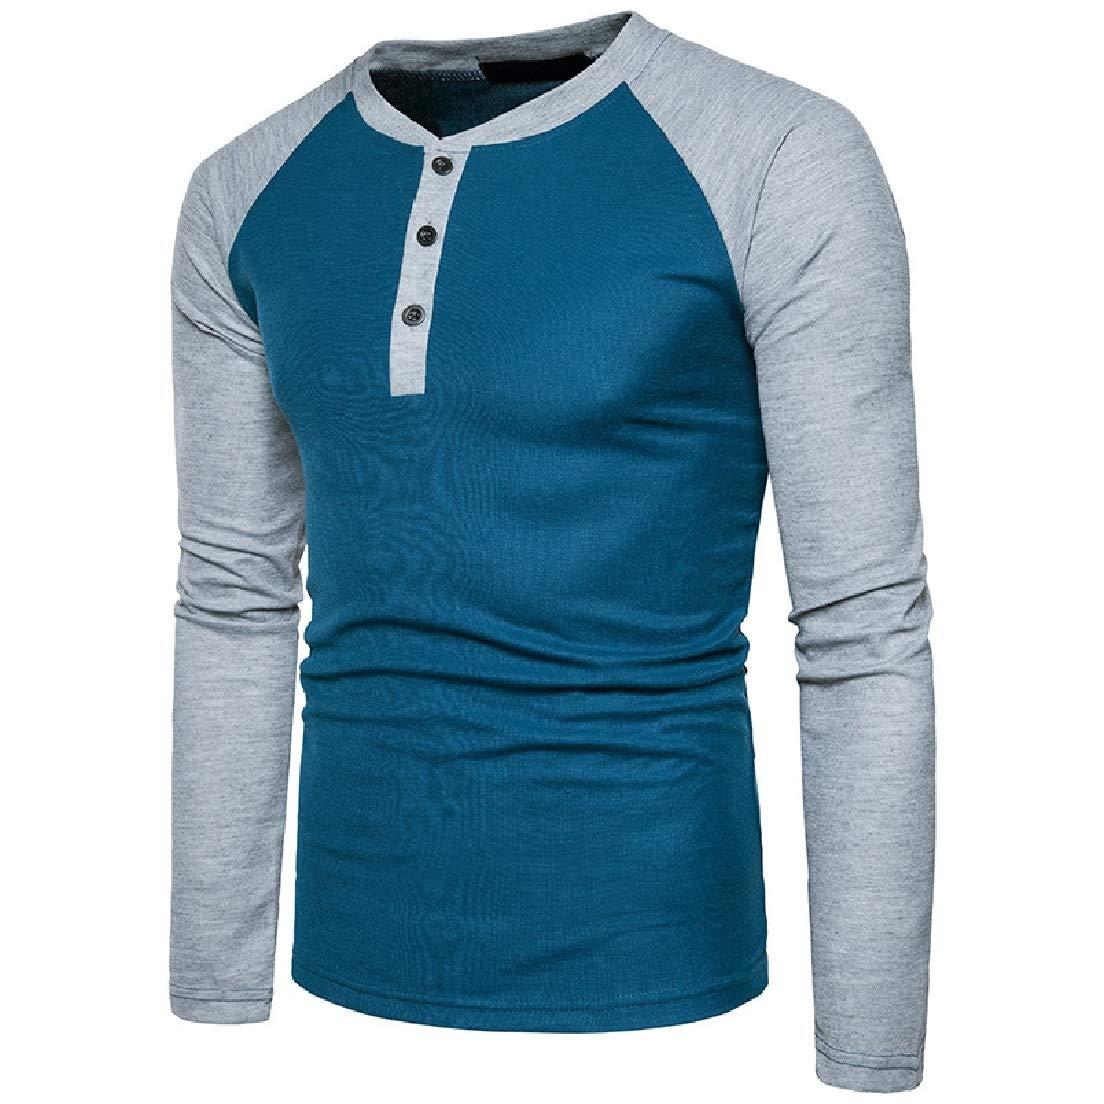 CRYYU Men Slim Fit Henley T-Shirt Raglan Sleeve T-Shirt Casual Tops